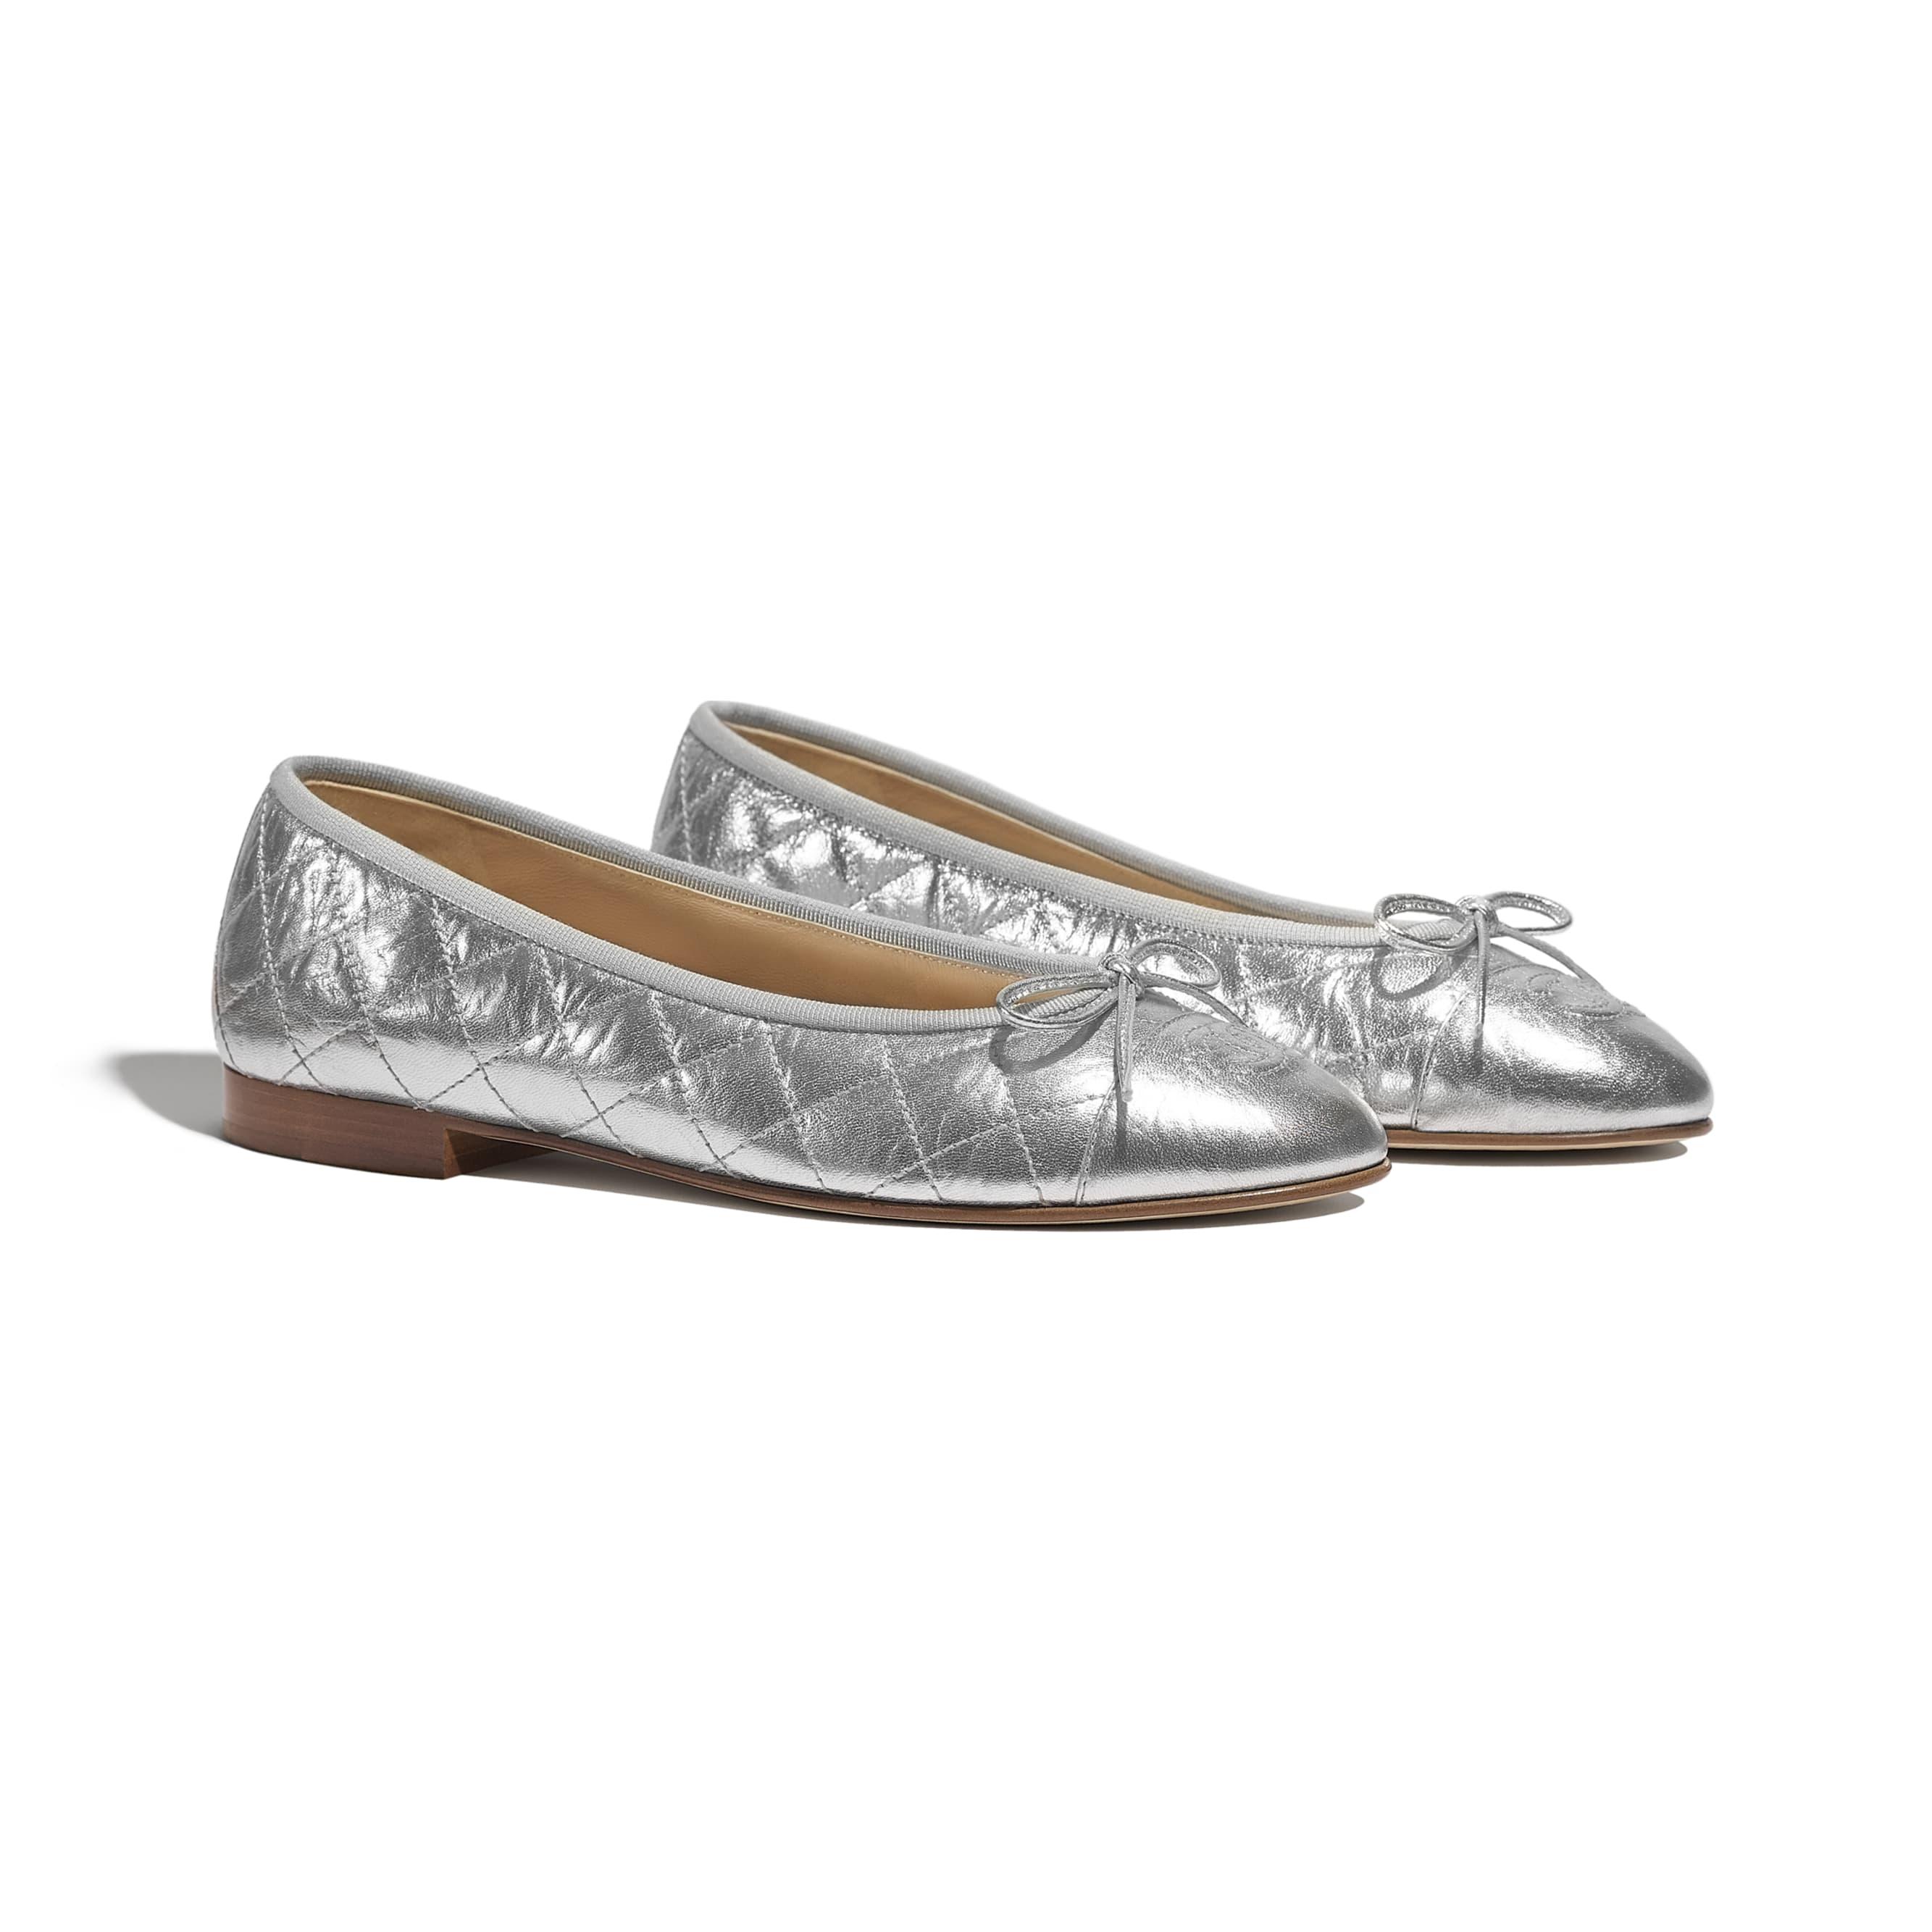 Ballerinas - Silver - Laminated Lambskin - CHANEL - Alternative view - see standard sized version